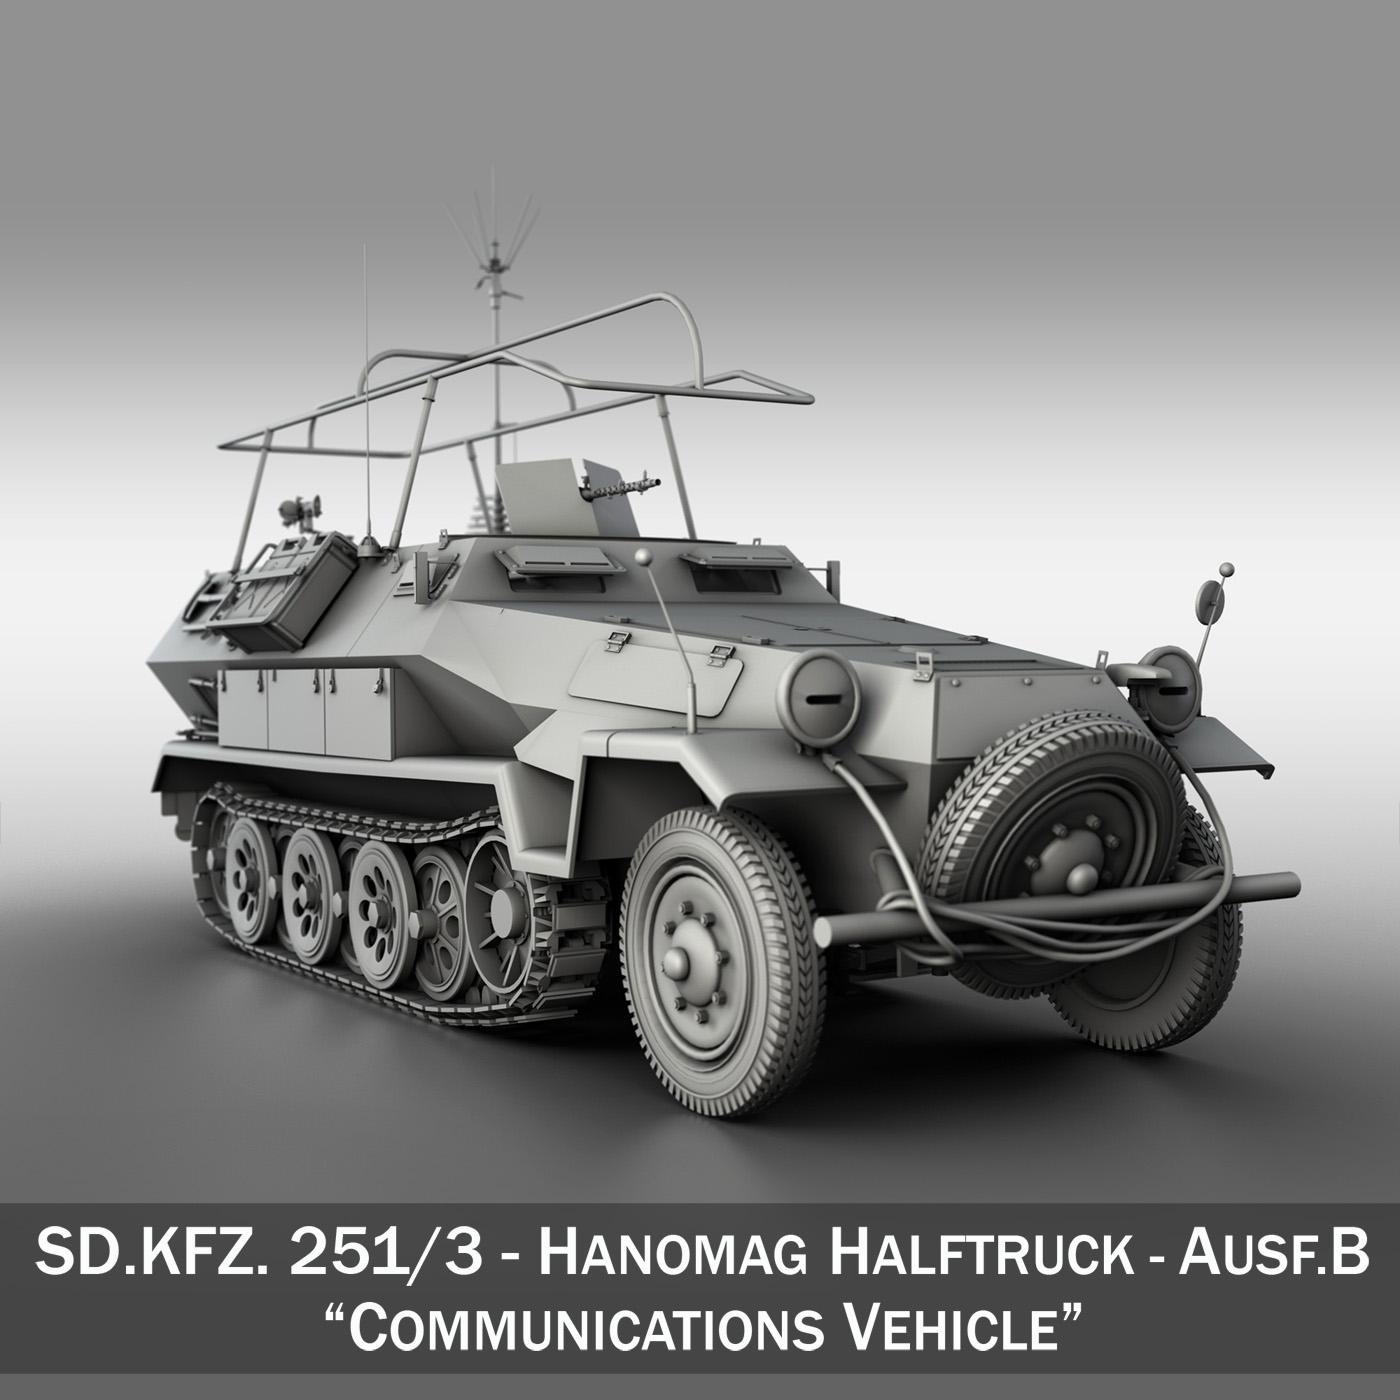 sdkfz 251 ausf.b – communications vehicle 3d model 3ds fbx c4d lwo obj 251691